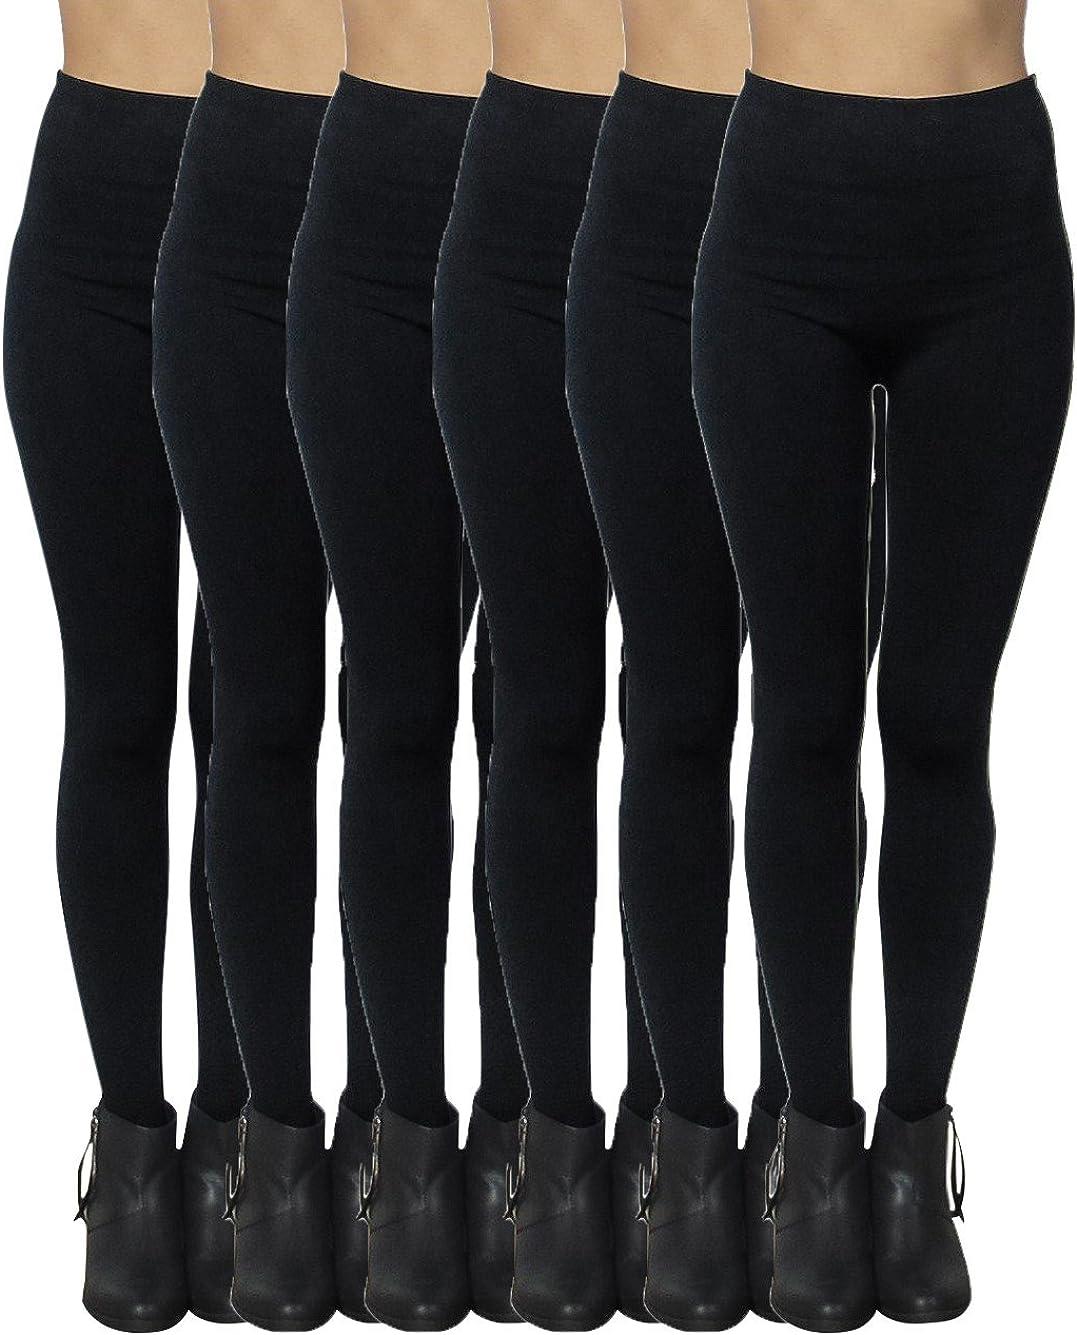 Womens Black Seamless Leggings Fleece Lined One Size